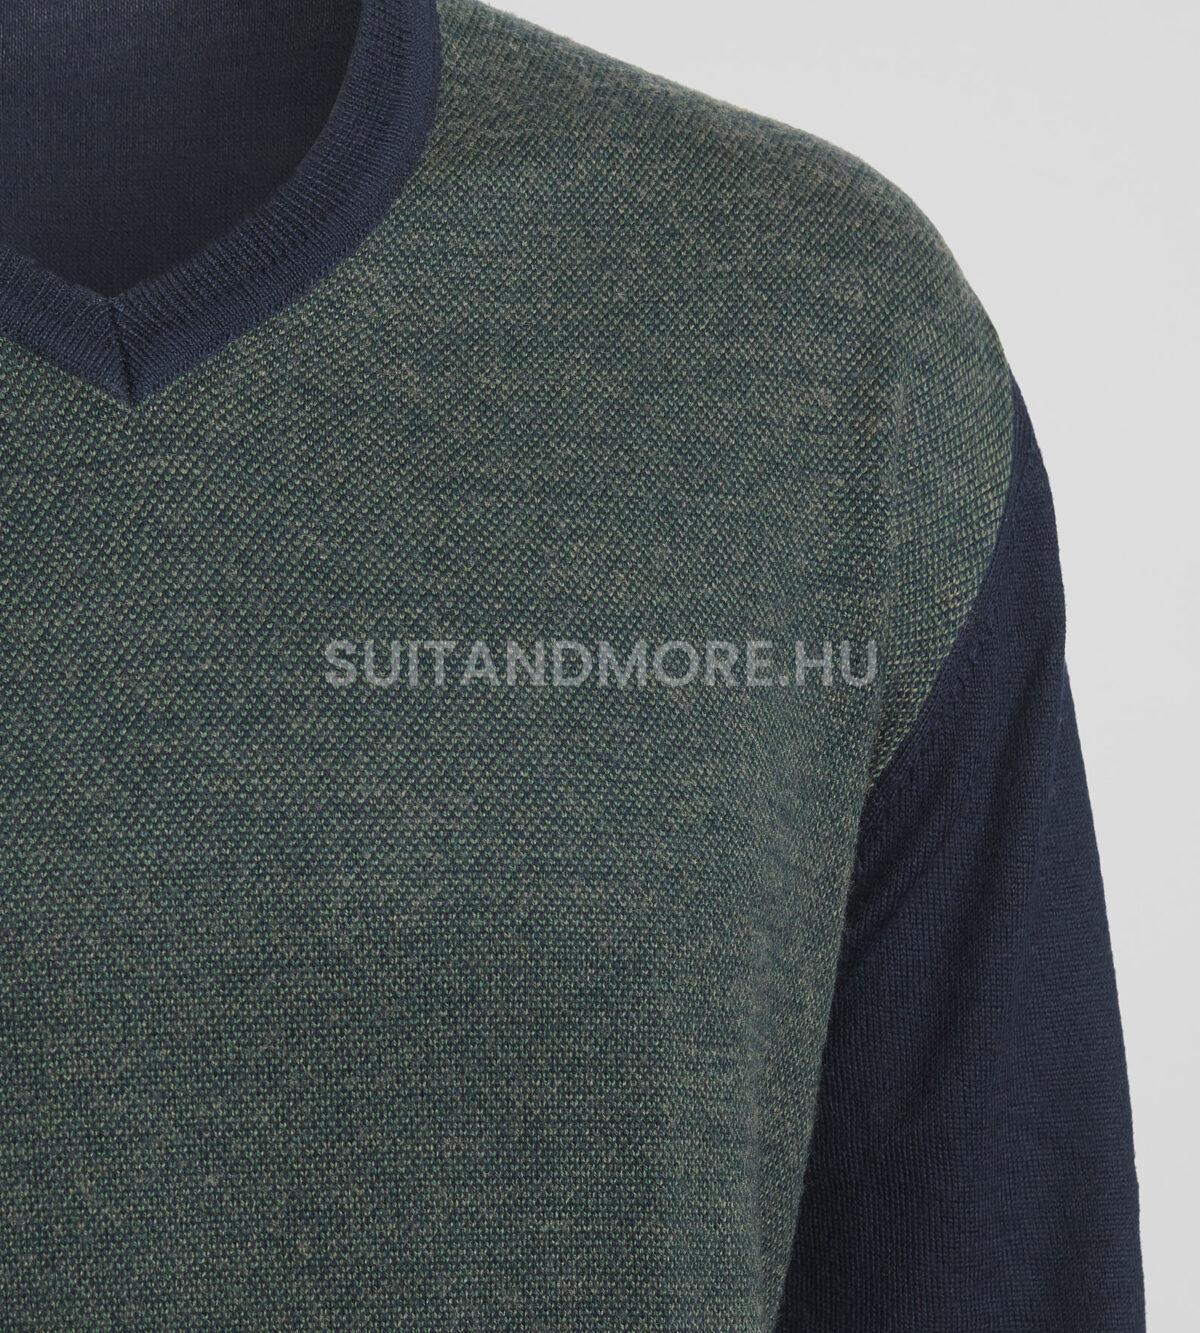 digel-sotetzold-modern-fit-v-nyaku-gyapju-pulover-fabrizio1-1-1278007-52-02